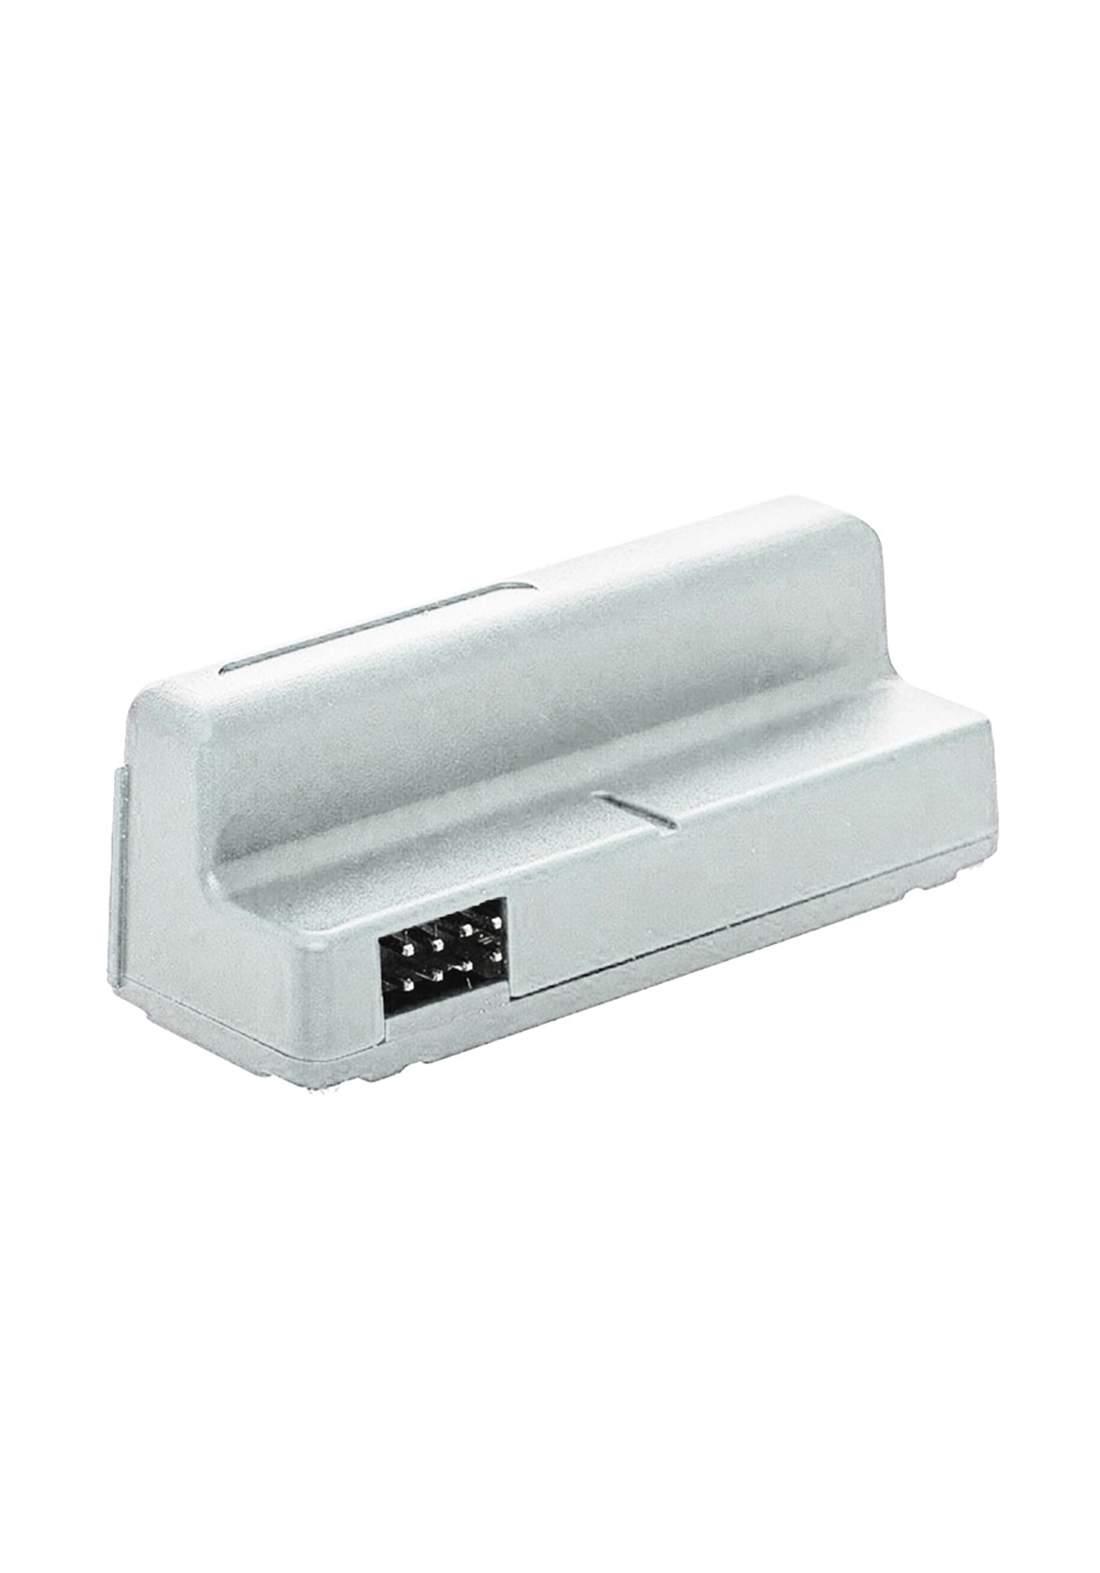 Yale AC-LM Smart Home Alarm Accessory Lock Module  وحدة قفل ذكية لملحقات الإنذار للمنزل